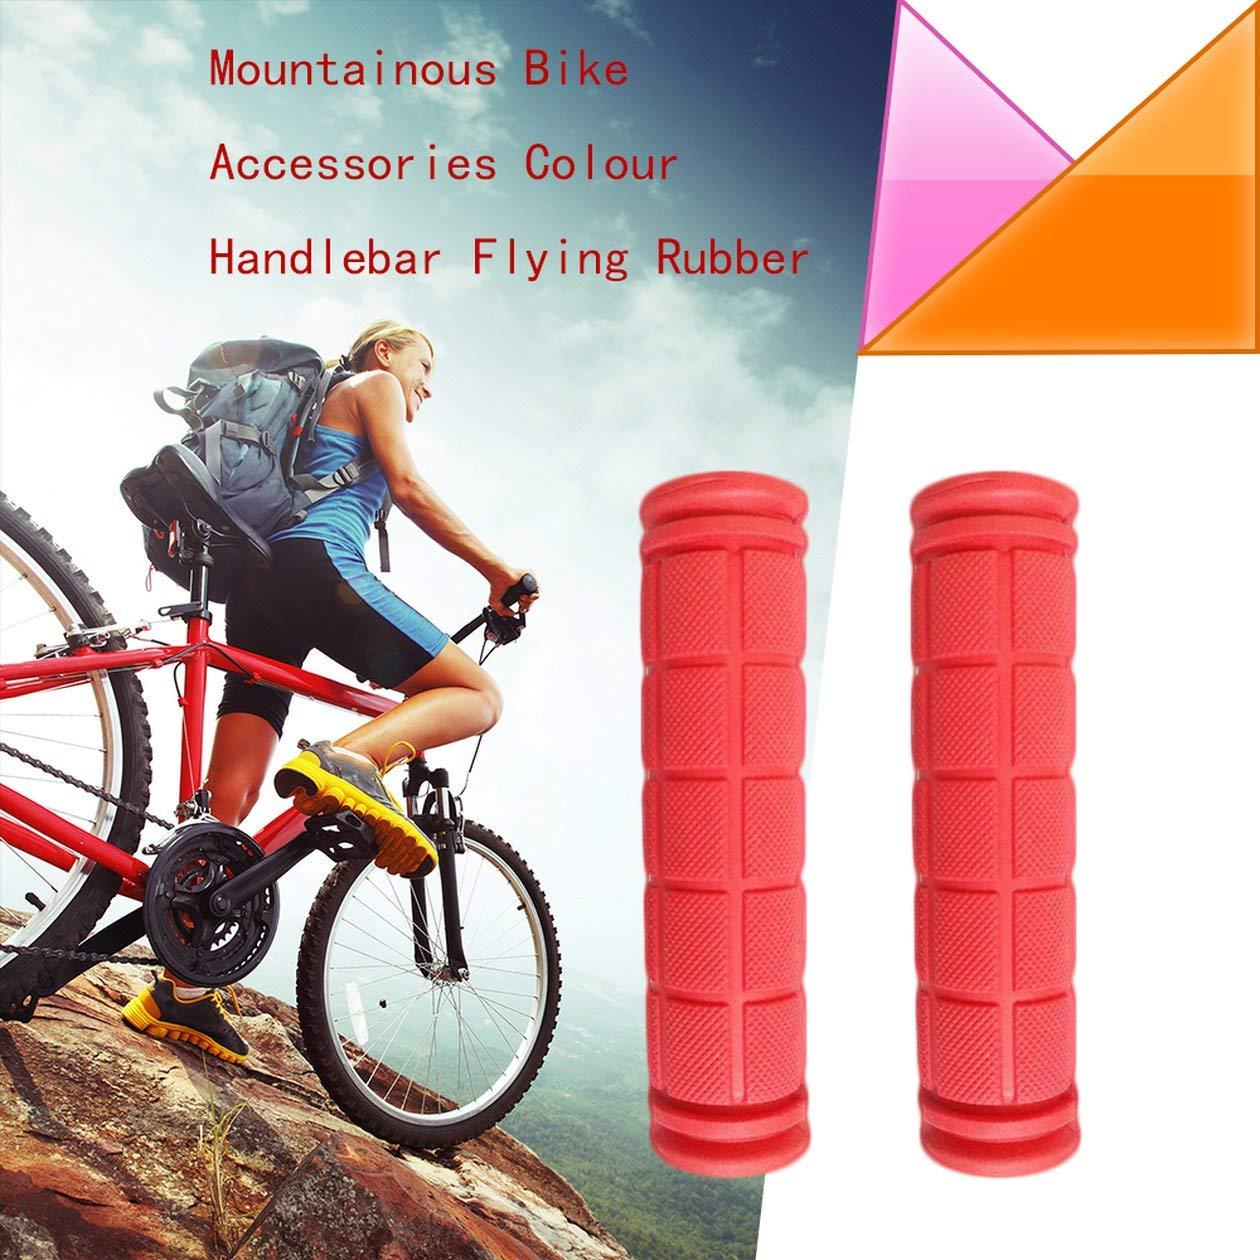 Rojo Pu/ños de Manillar de Bicicleta BIYI Pu/ños de Bicicleta de Goma Ergo Pu/ños de Bicicleta de Forma ergon/ómica y vibraci/ón//Pu/ños de Goma absorbentes de Golpes